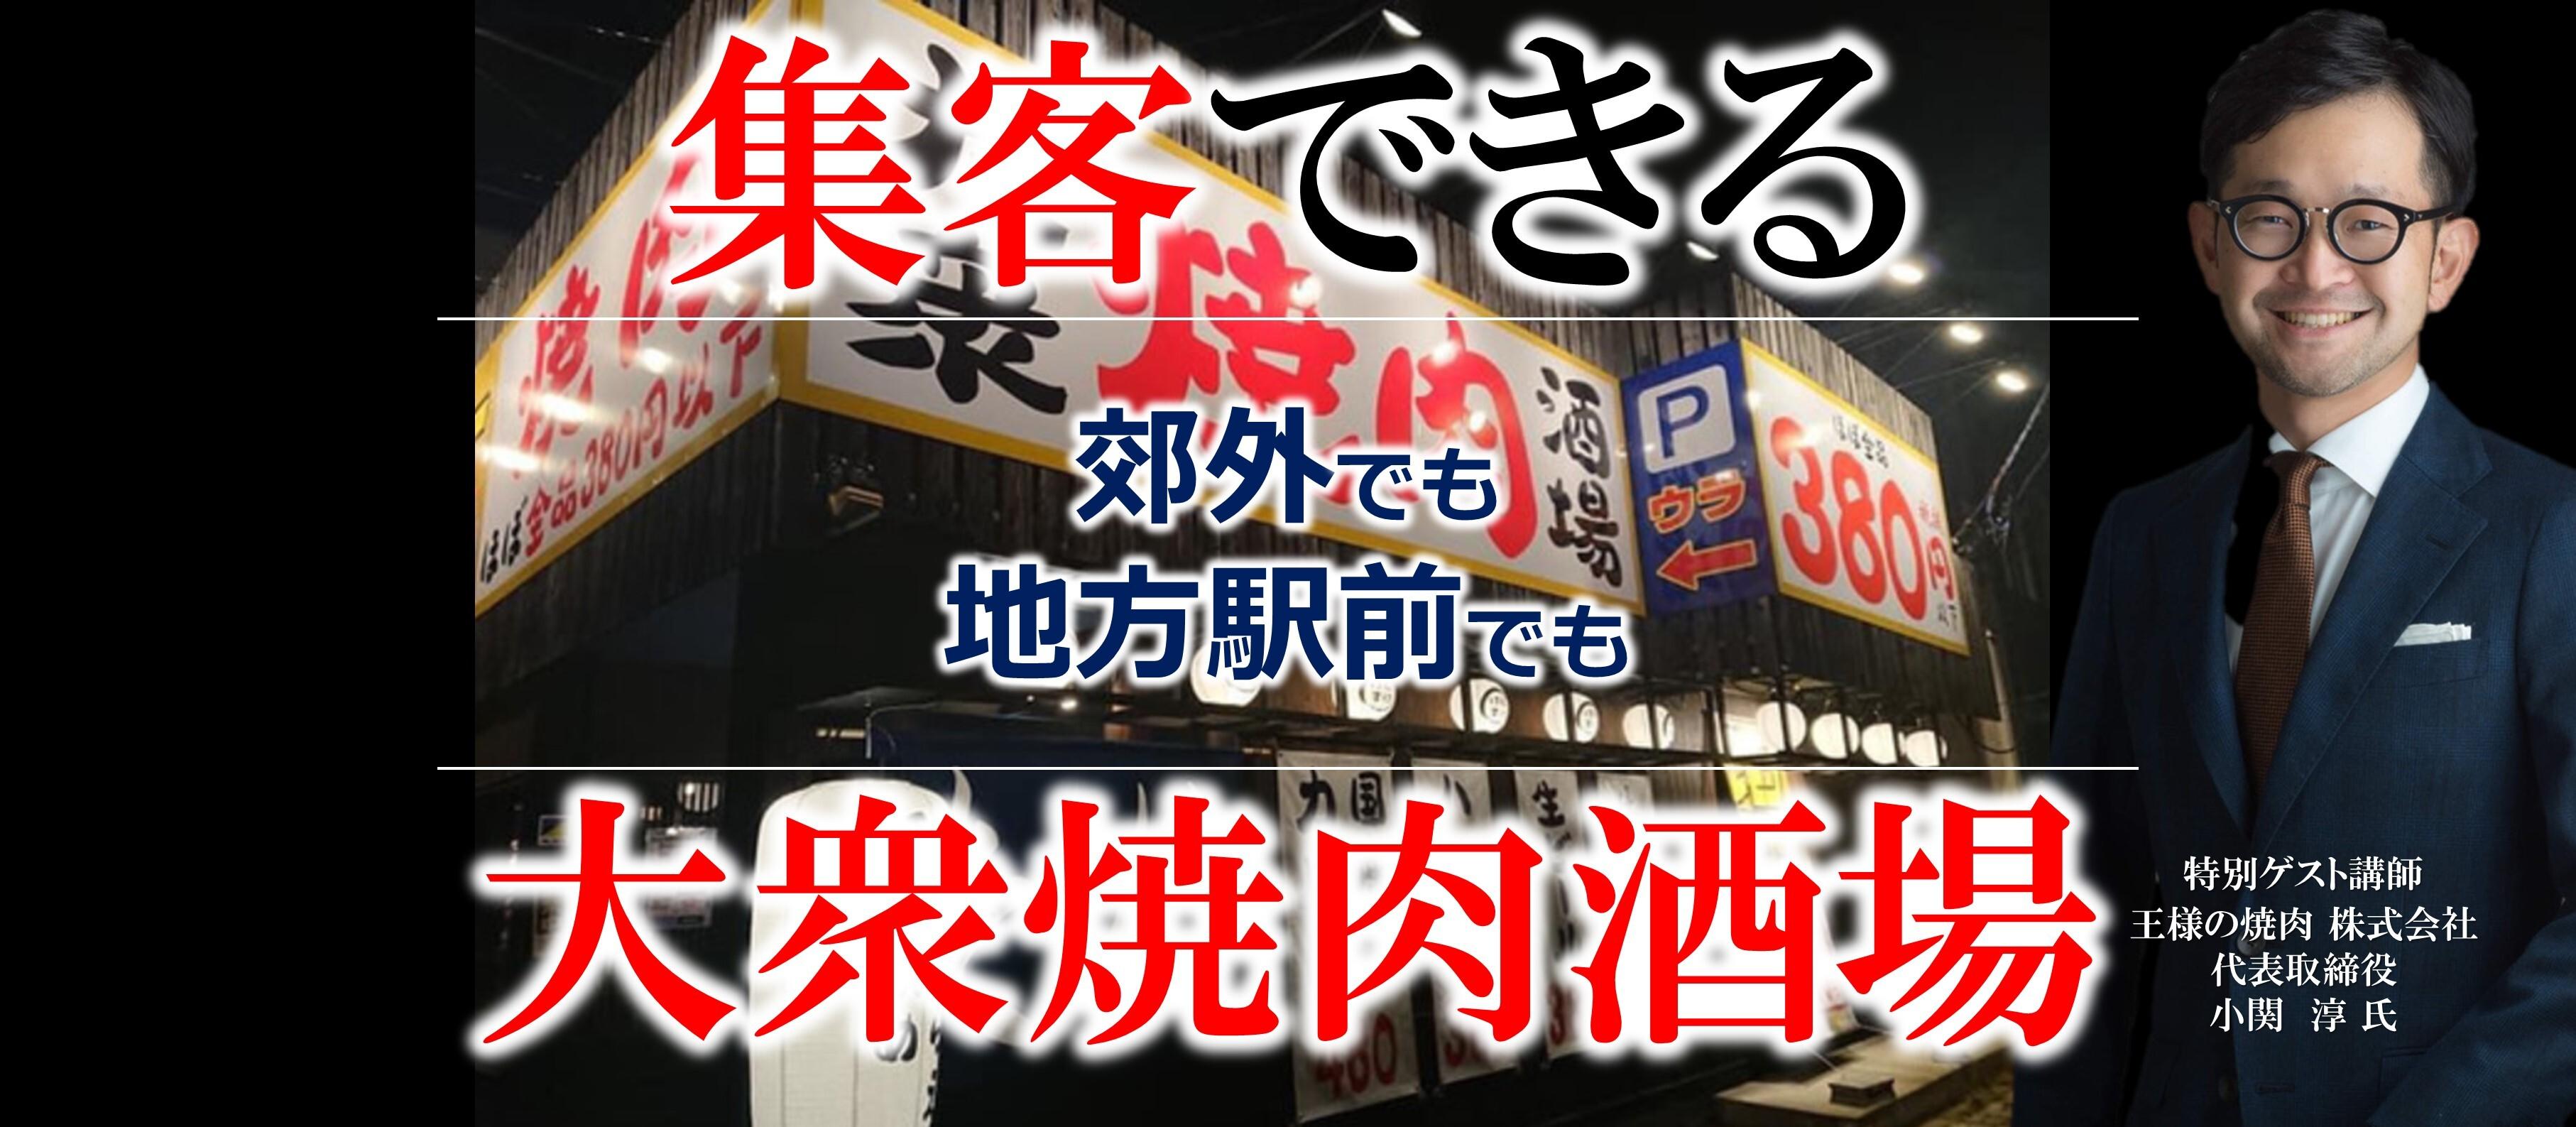 【webセミナー】郊外でも地方駅前でも集客できる大衆焼肉酒場